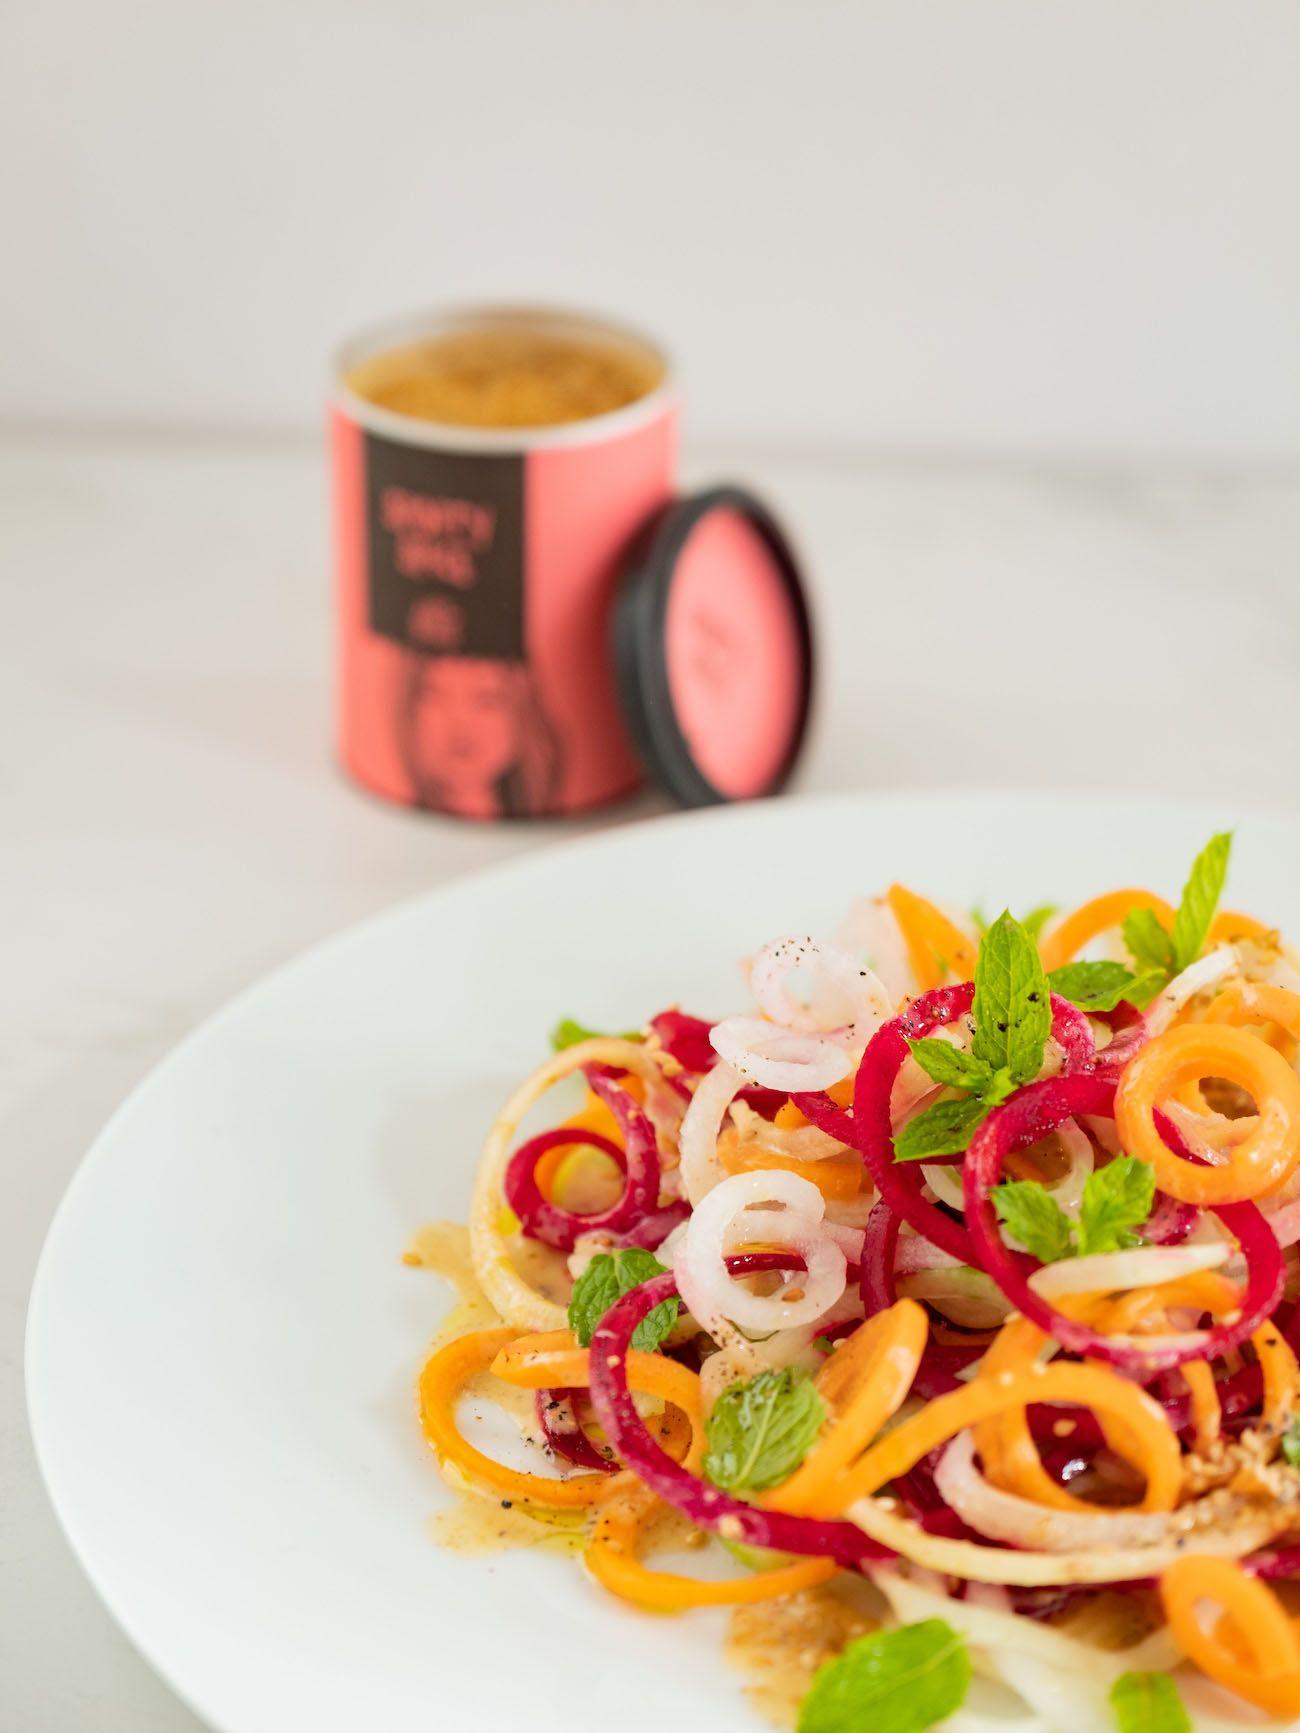 About Fuel, Foodblog, Rezept, Bunter Spiralensalat mit Tahini-Dressing, Just Spices, Karotte, Gurke, Gewürz